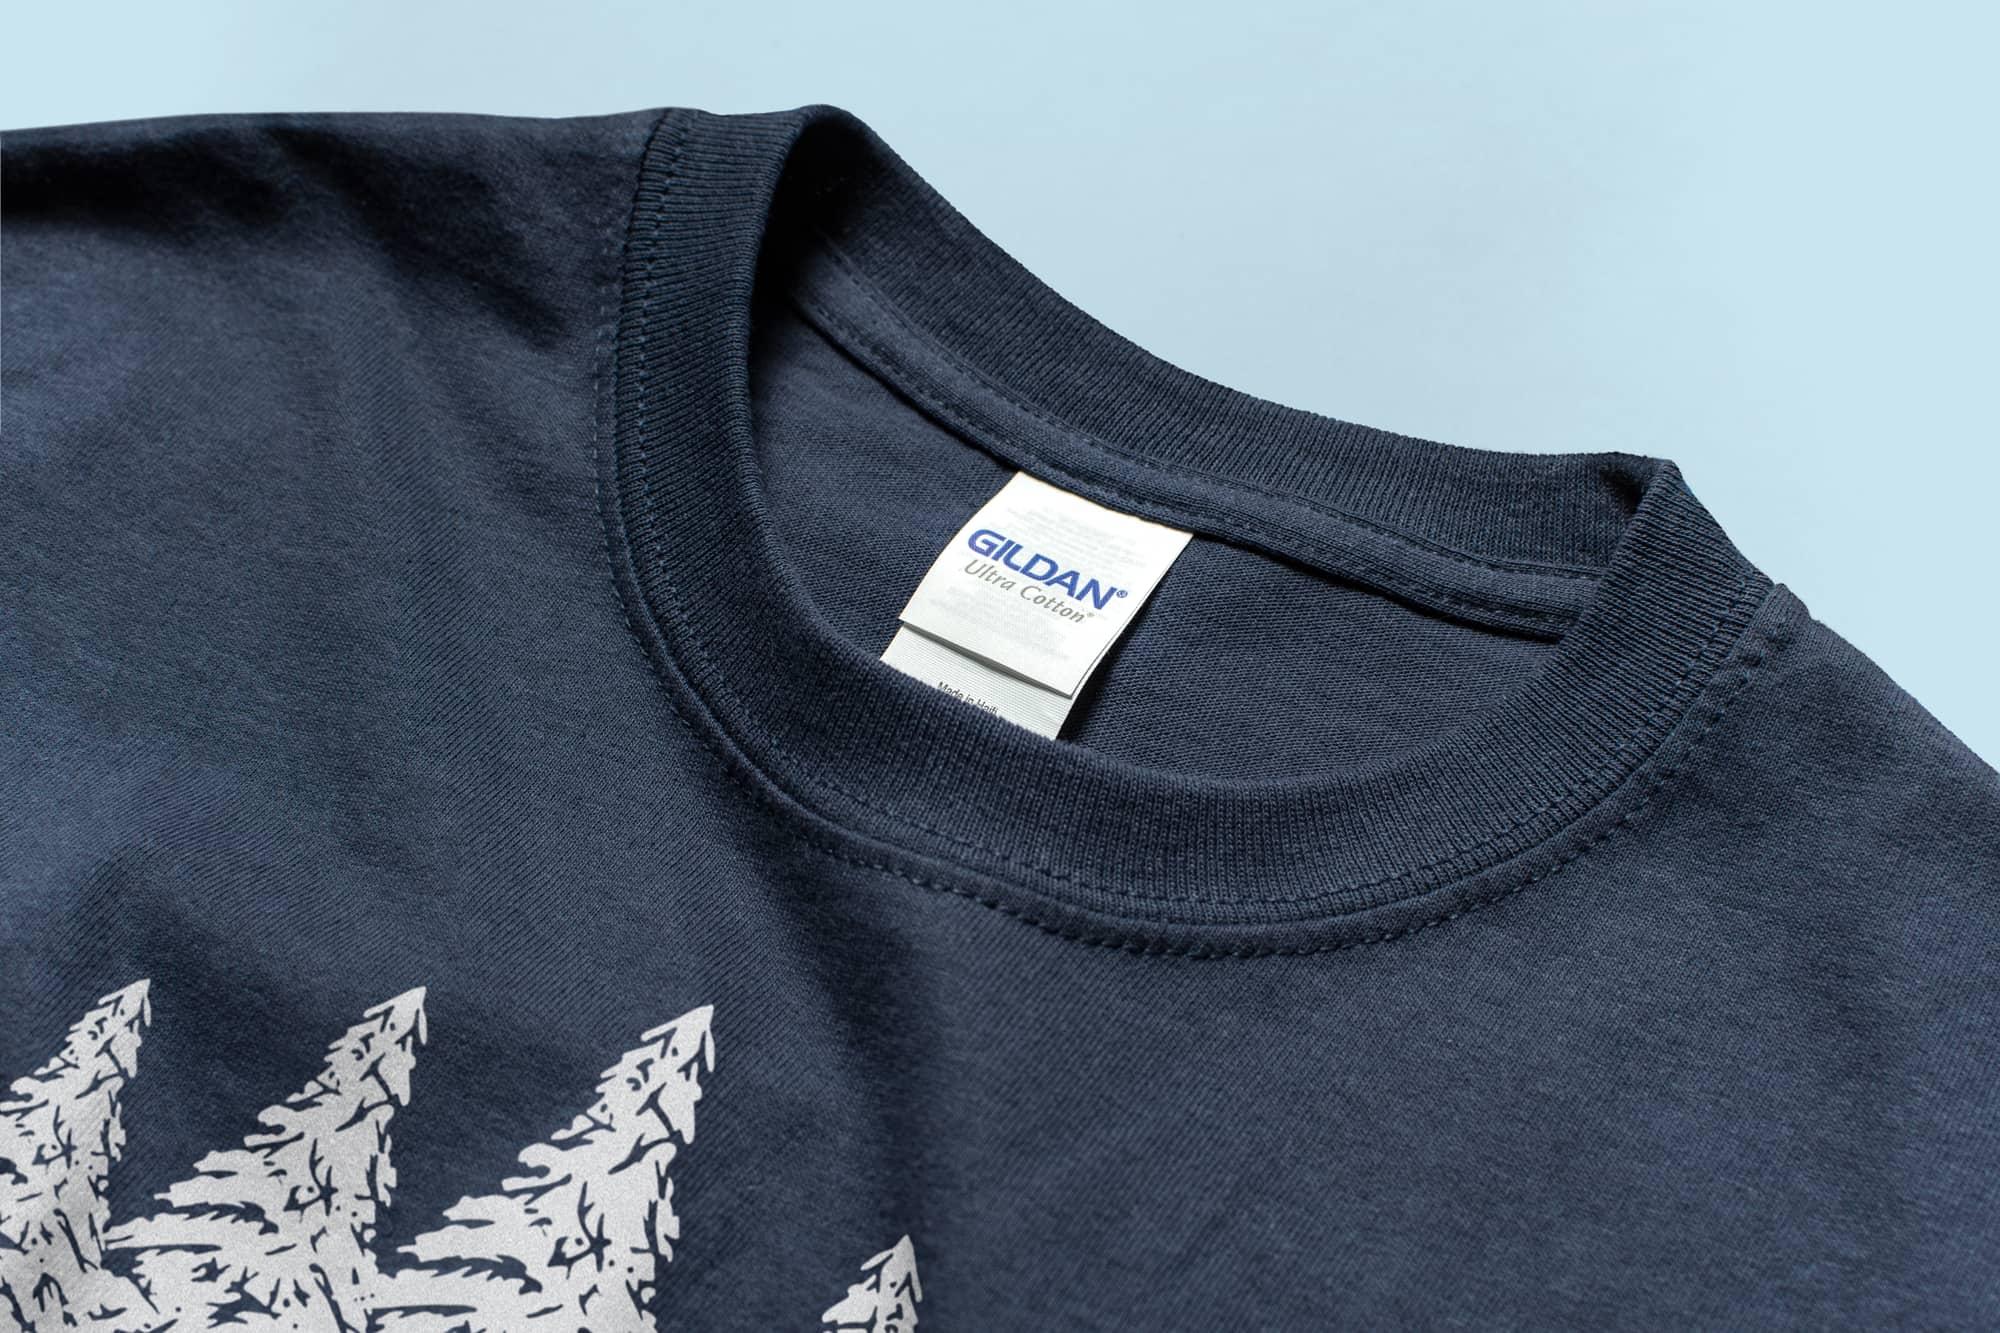 Detail of the collar of the Gildan Ultra Cotton Tee.